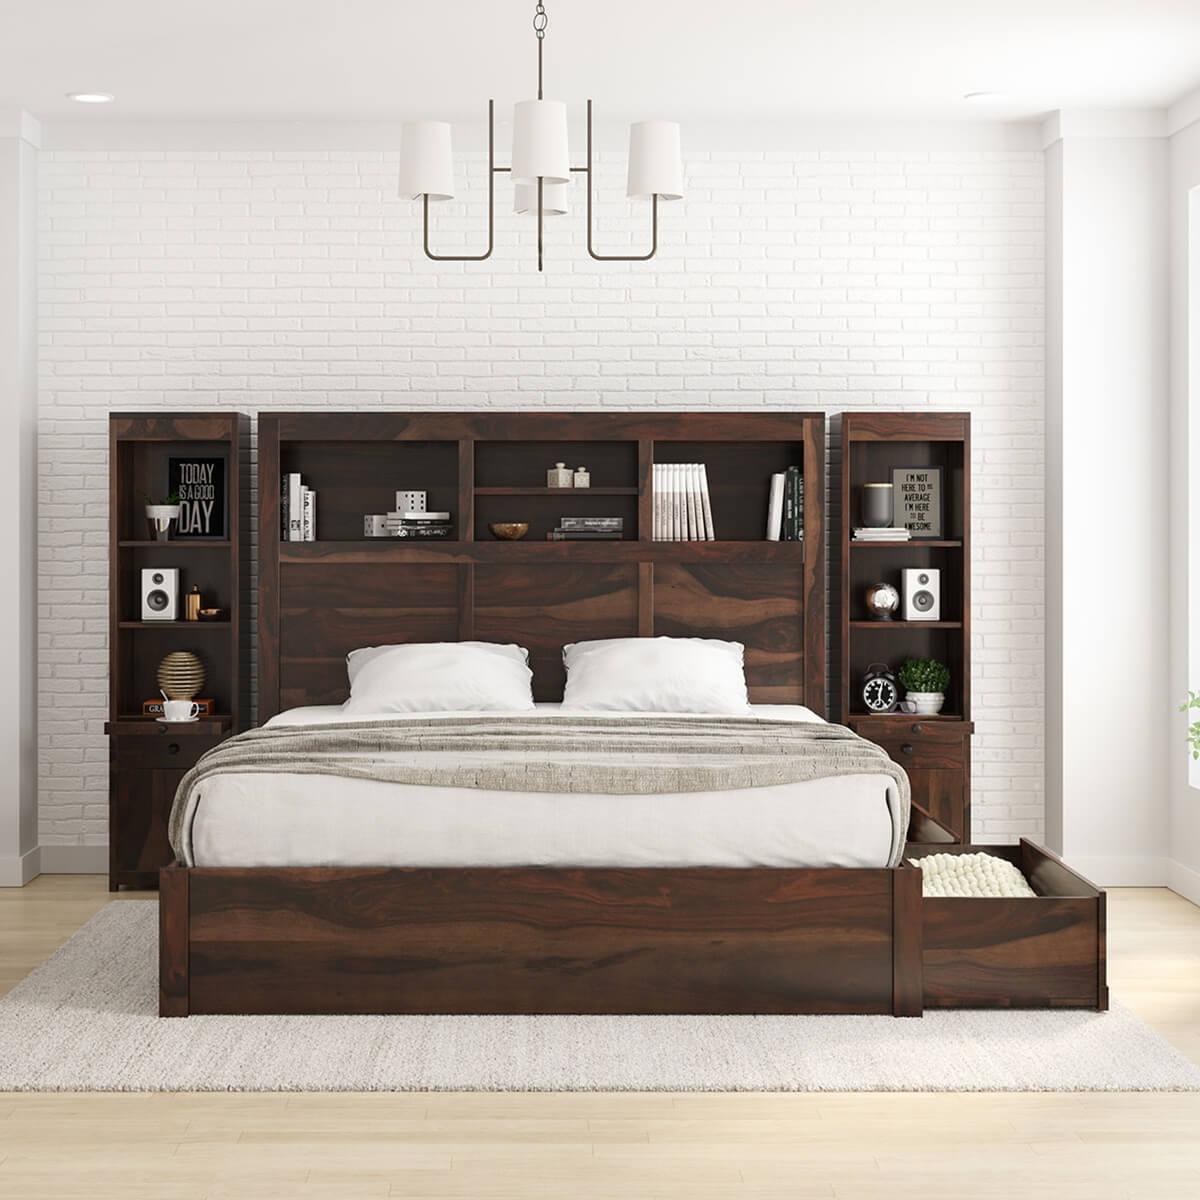 Wood Platform Bed With Storage